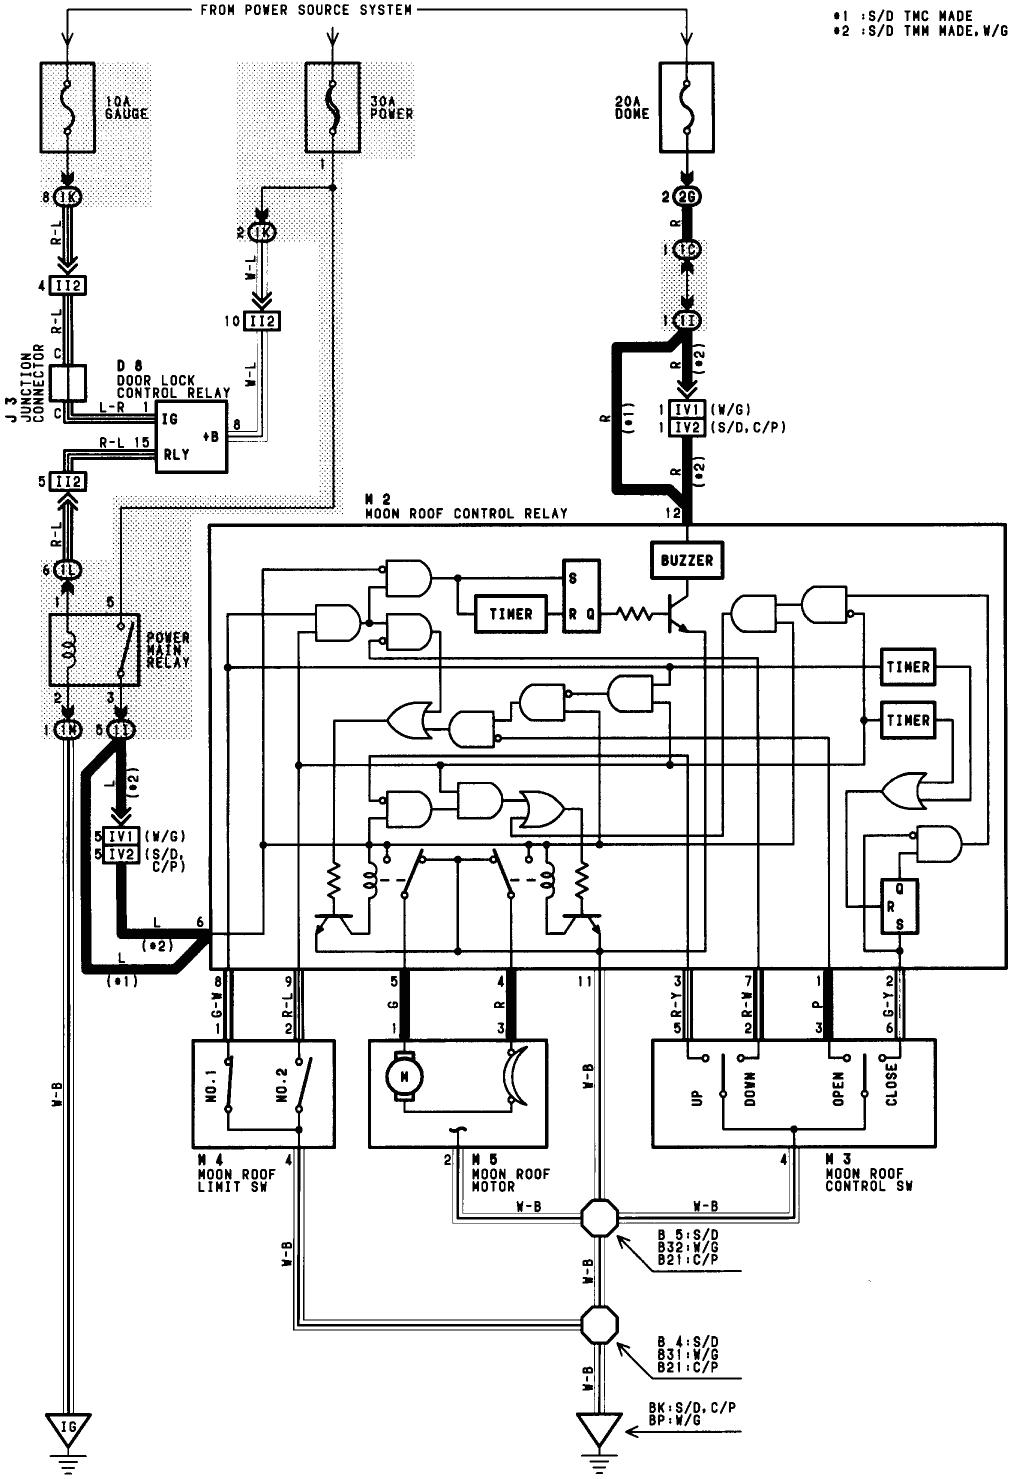 2002 Camry Wiring Diagram Pdf 1991 Camry Wiring Diagram Wiring Diagram Autovehicle